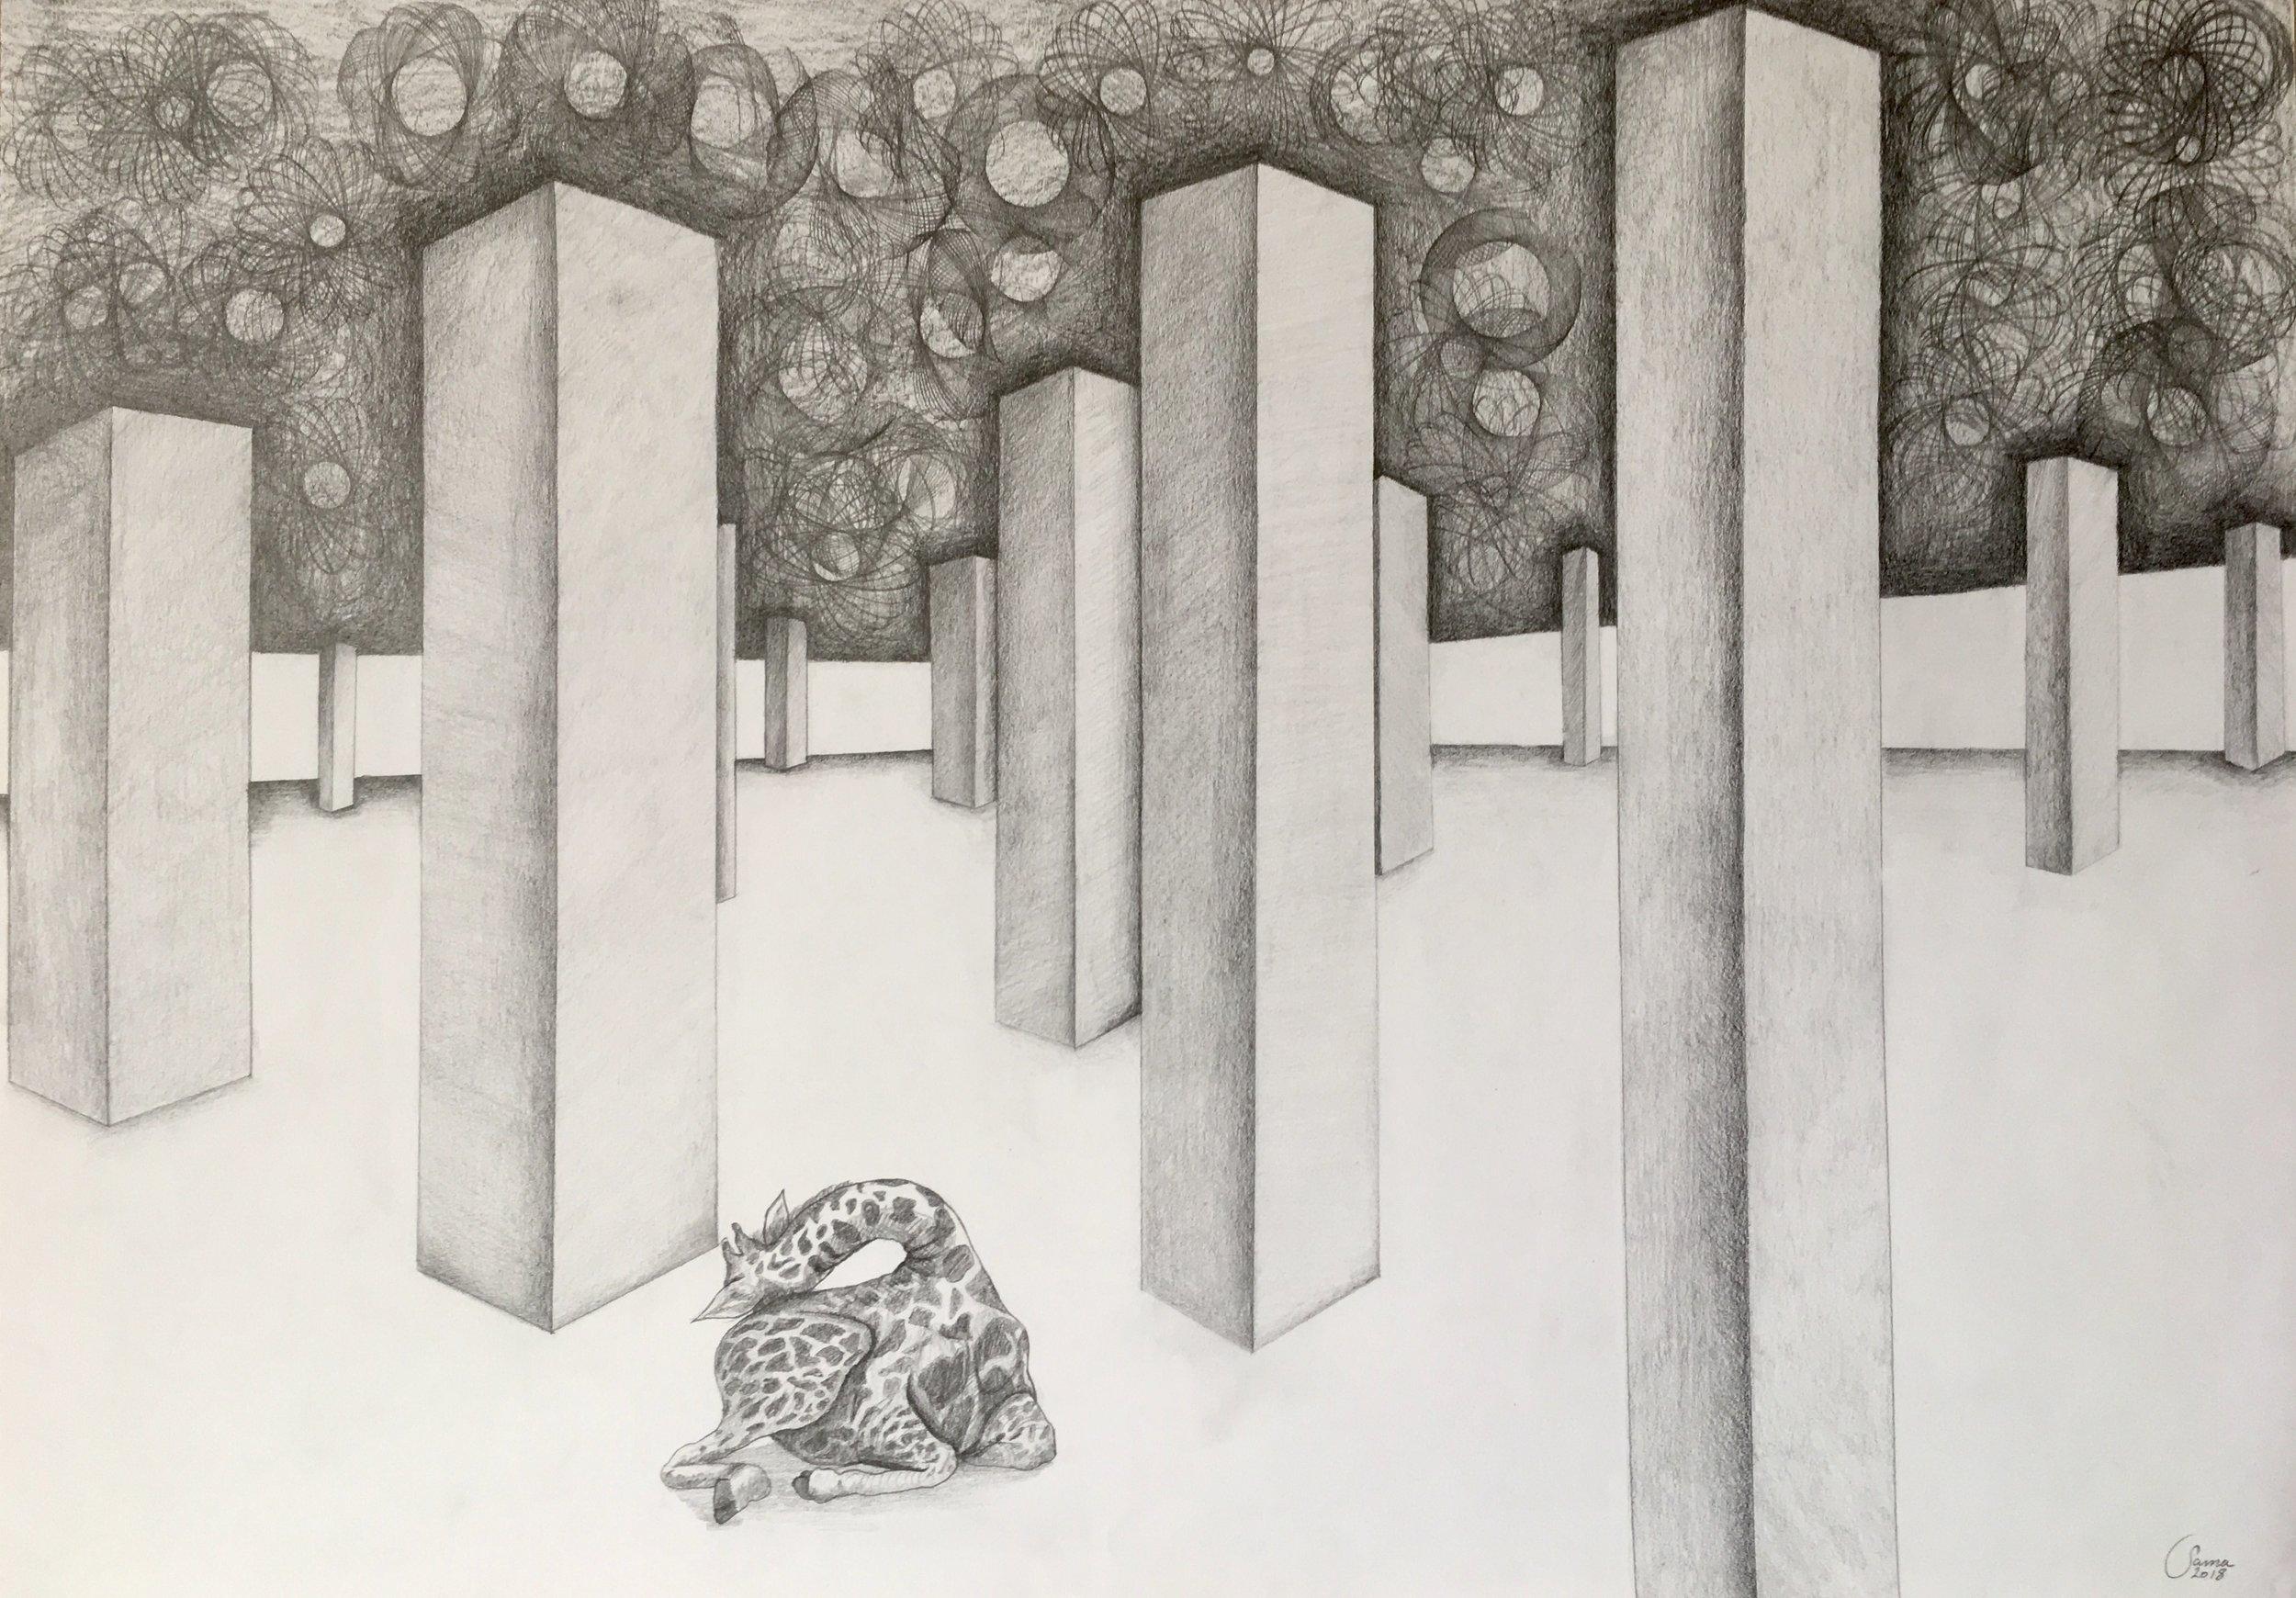 Giraffe Parking Lot, pencil on paper, 42 x 59 cm, 2018